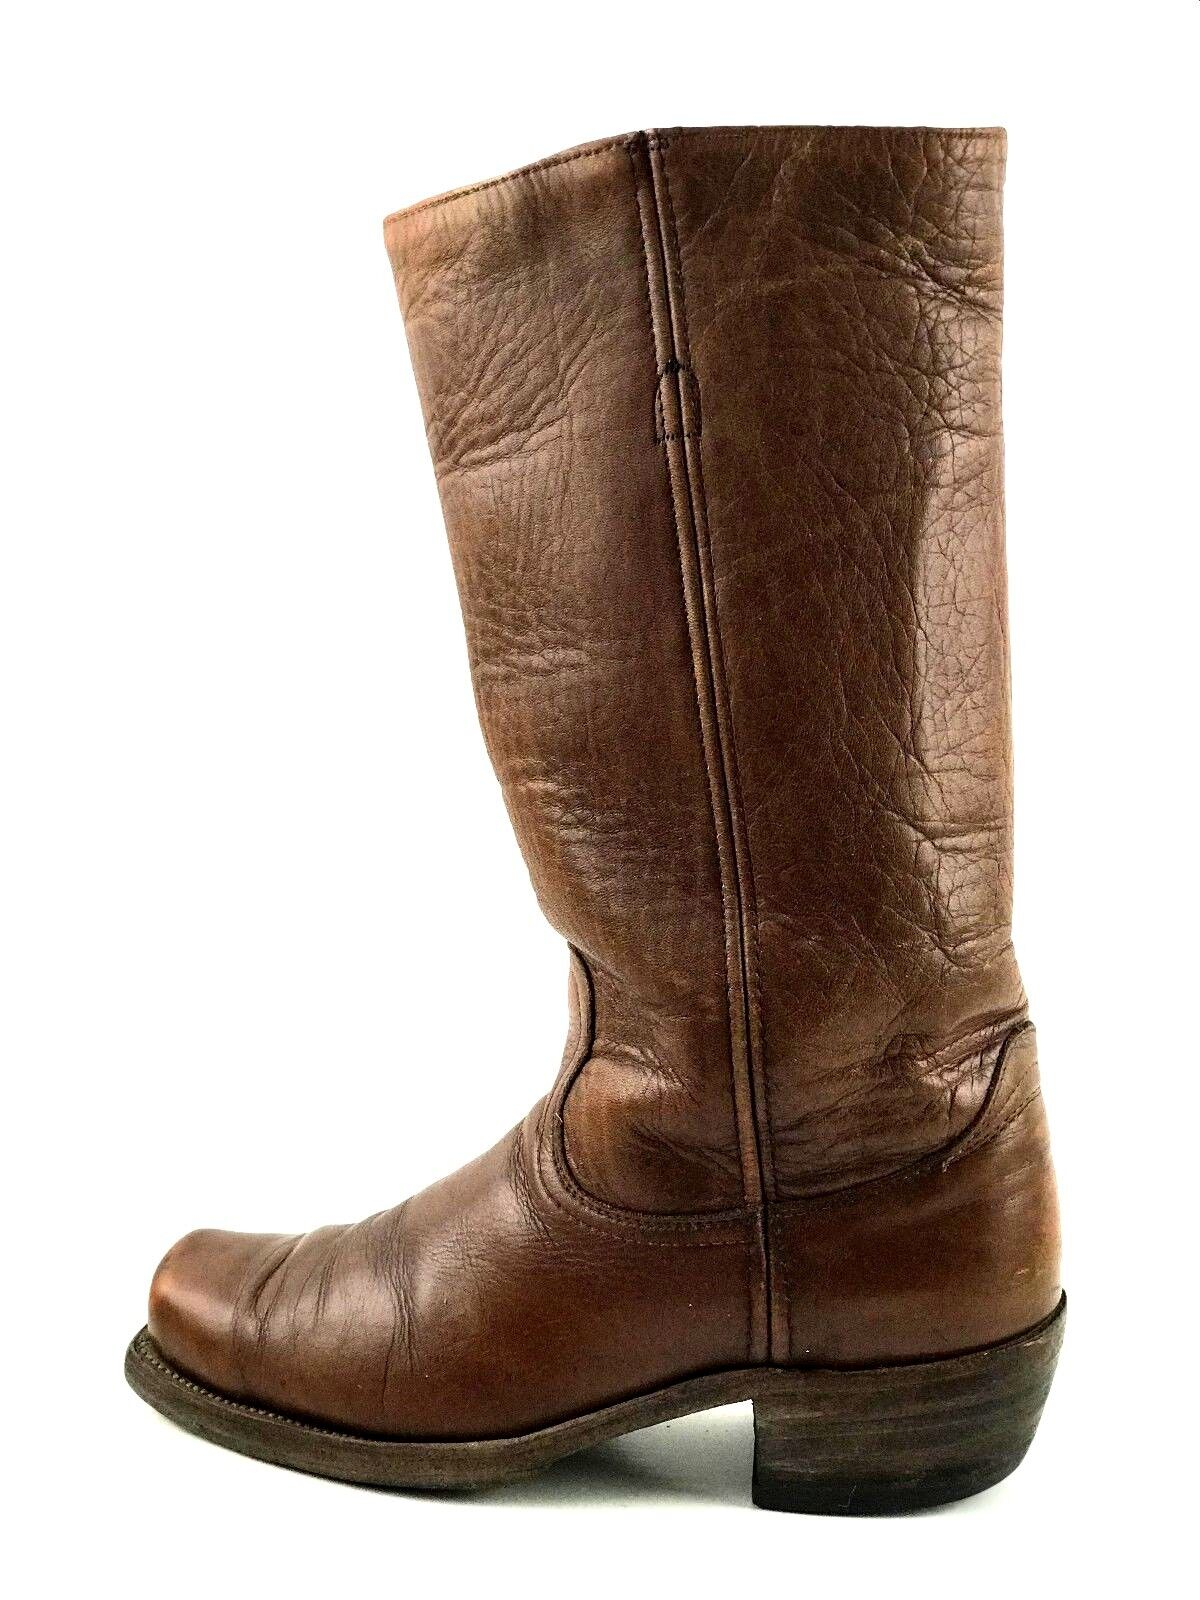 Frye Motorcycle Boots Boots Boots Men's Size US.7.5 UK.7 EU.40.5 Women's US.9 EU.39.5 UK.7 027a10